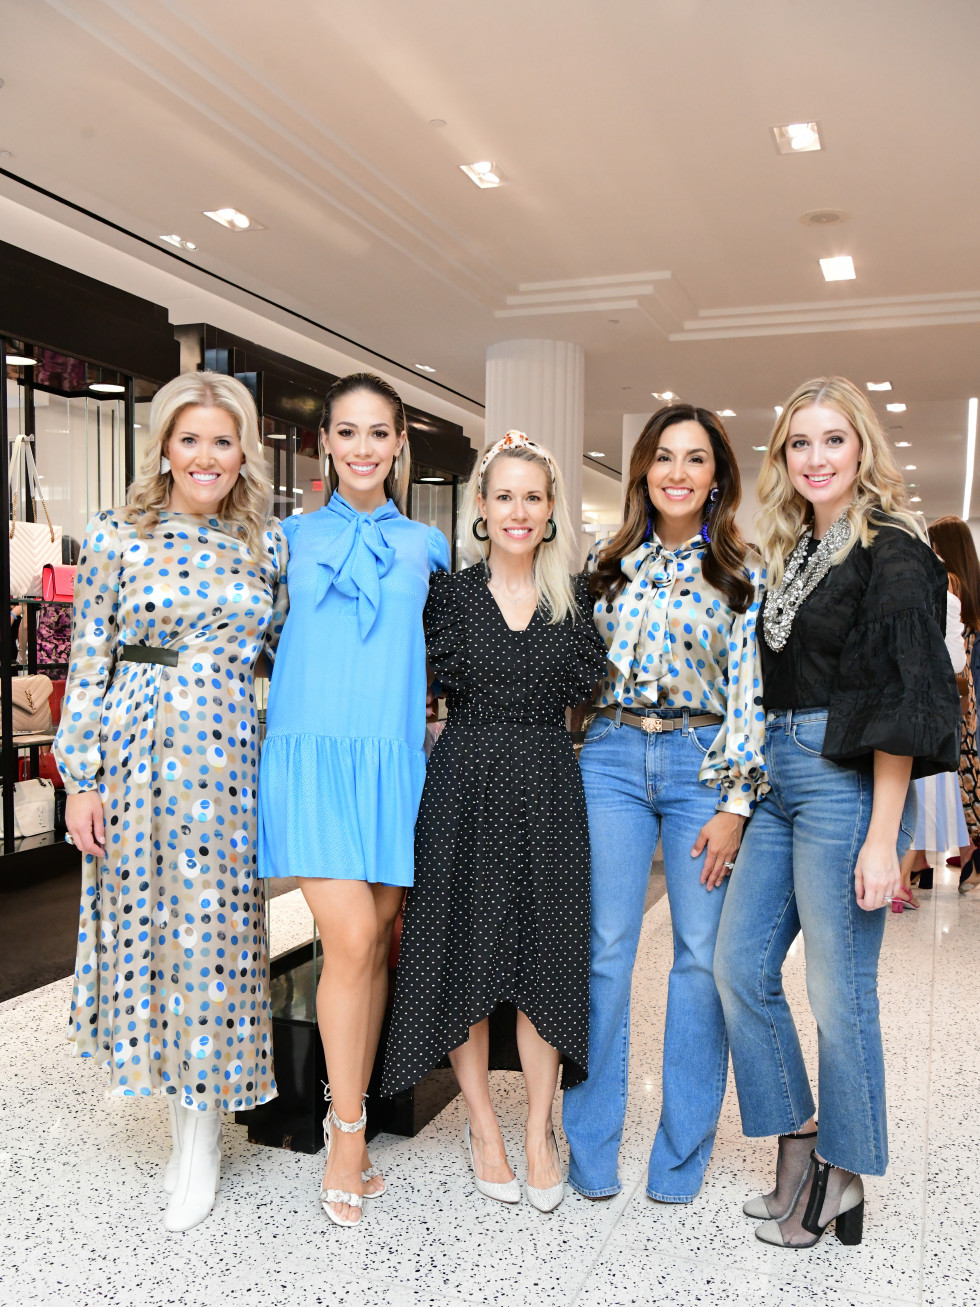 Summer Soiree Dress for Success WOW Tootsies Amanda Boffone, Daniella Rodriguez, Hunter Bell, Julie Longoria Chen, Courtney Campo